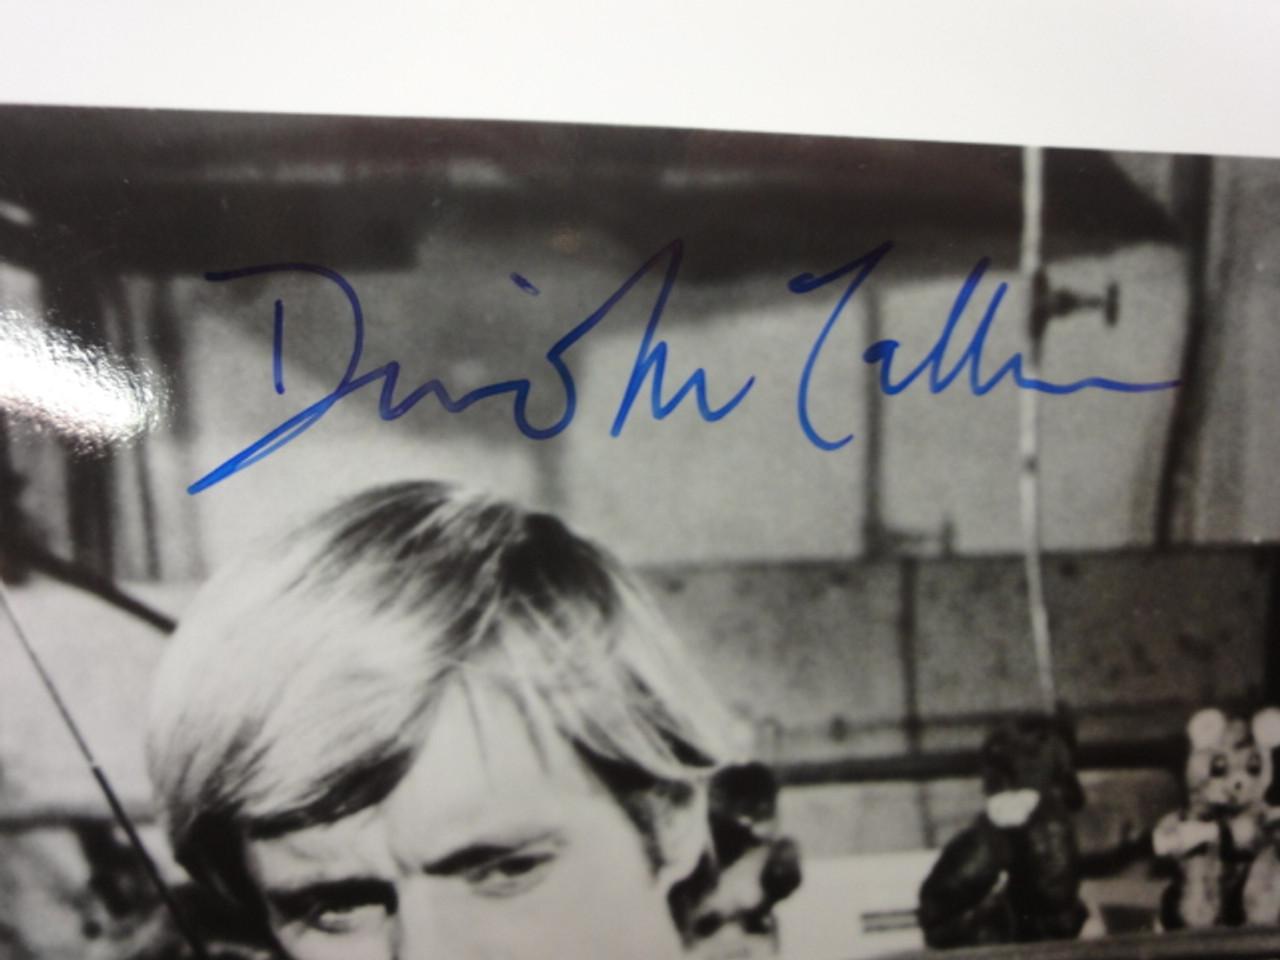 Man from UNCLE U.N.C.L.E. Robert Vaughn David McCallum Photo Signed Autograph Television Scene